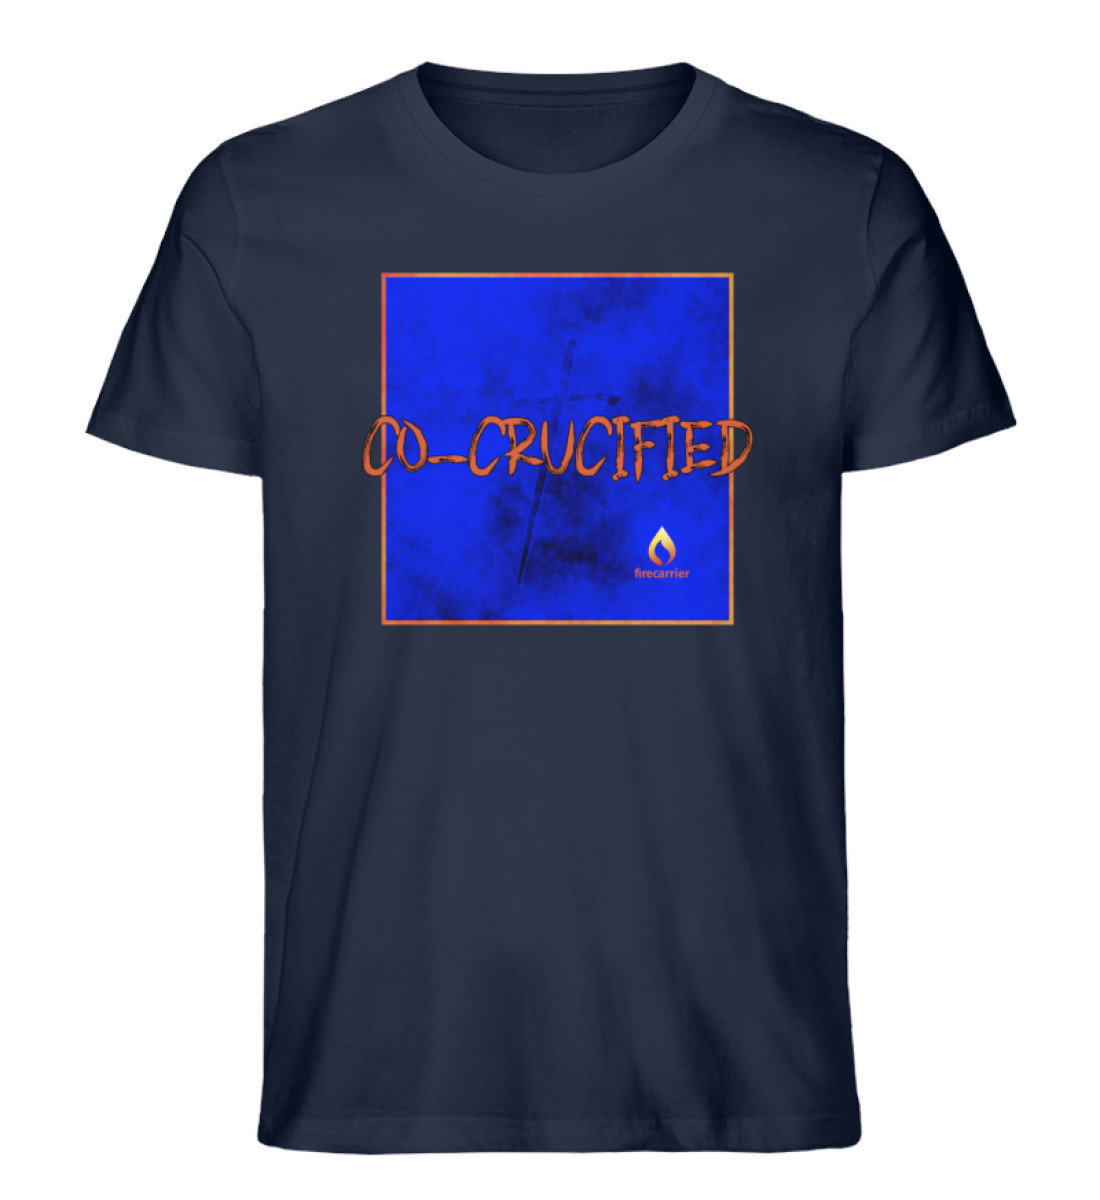 cocrucified - Men Premium Organic Shirt-6959